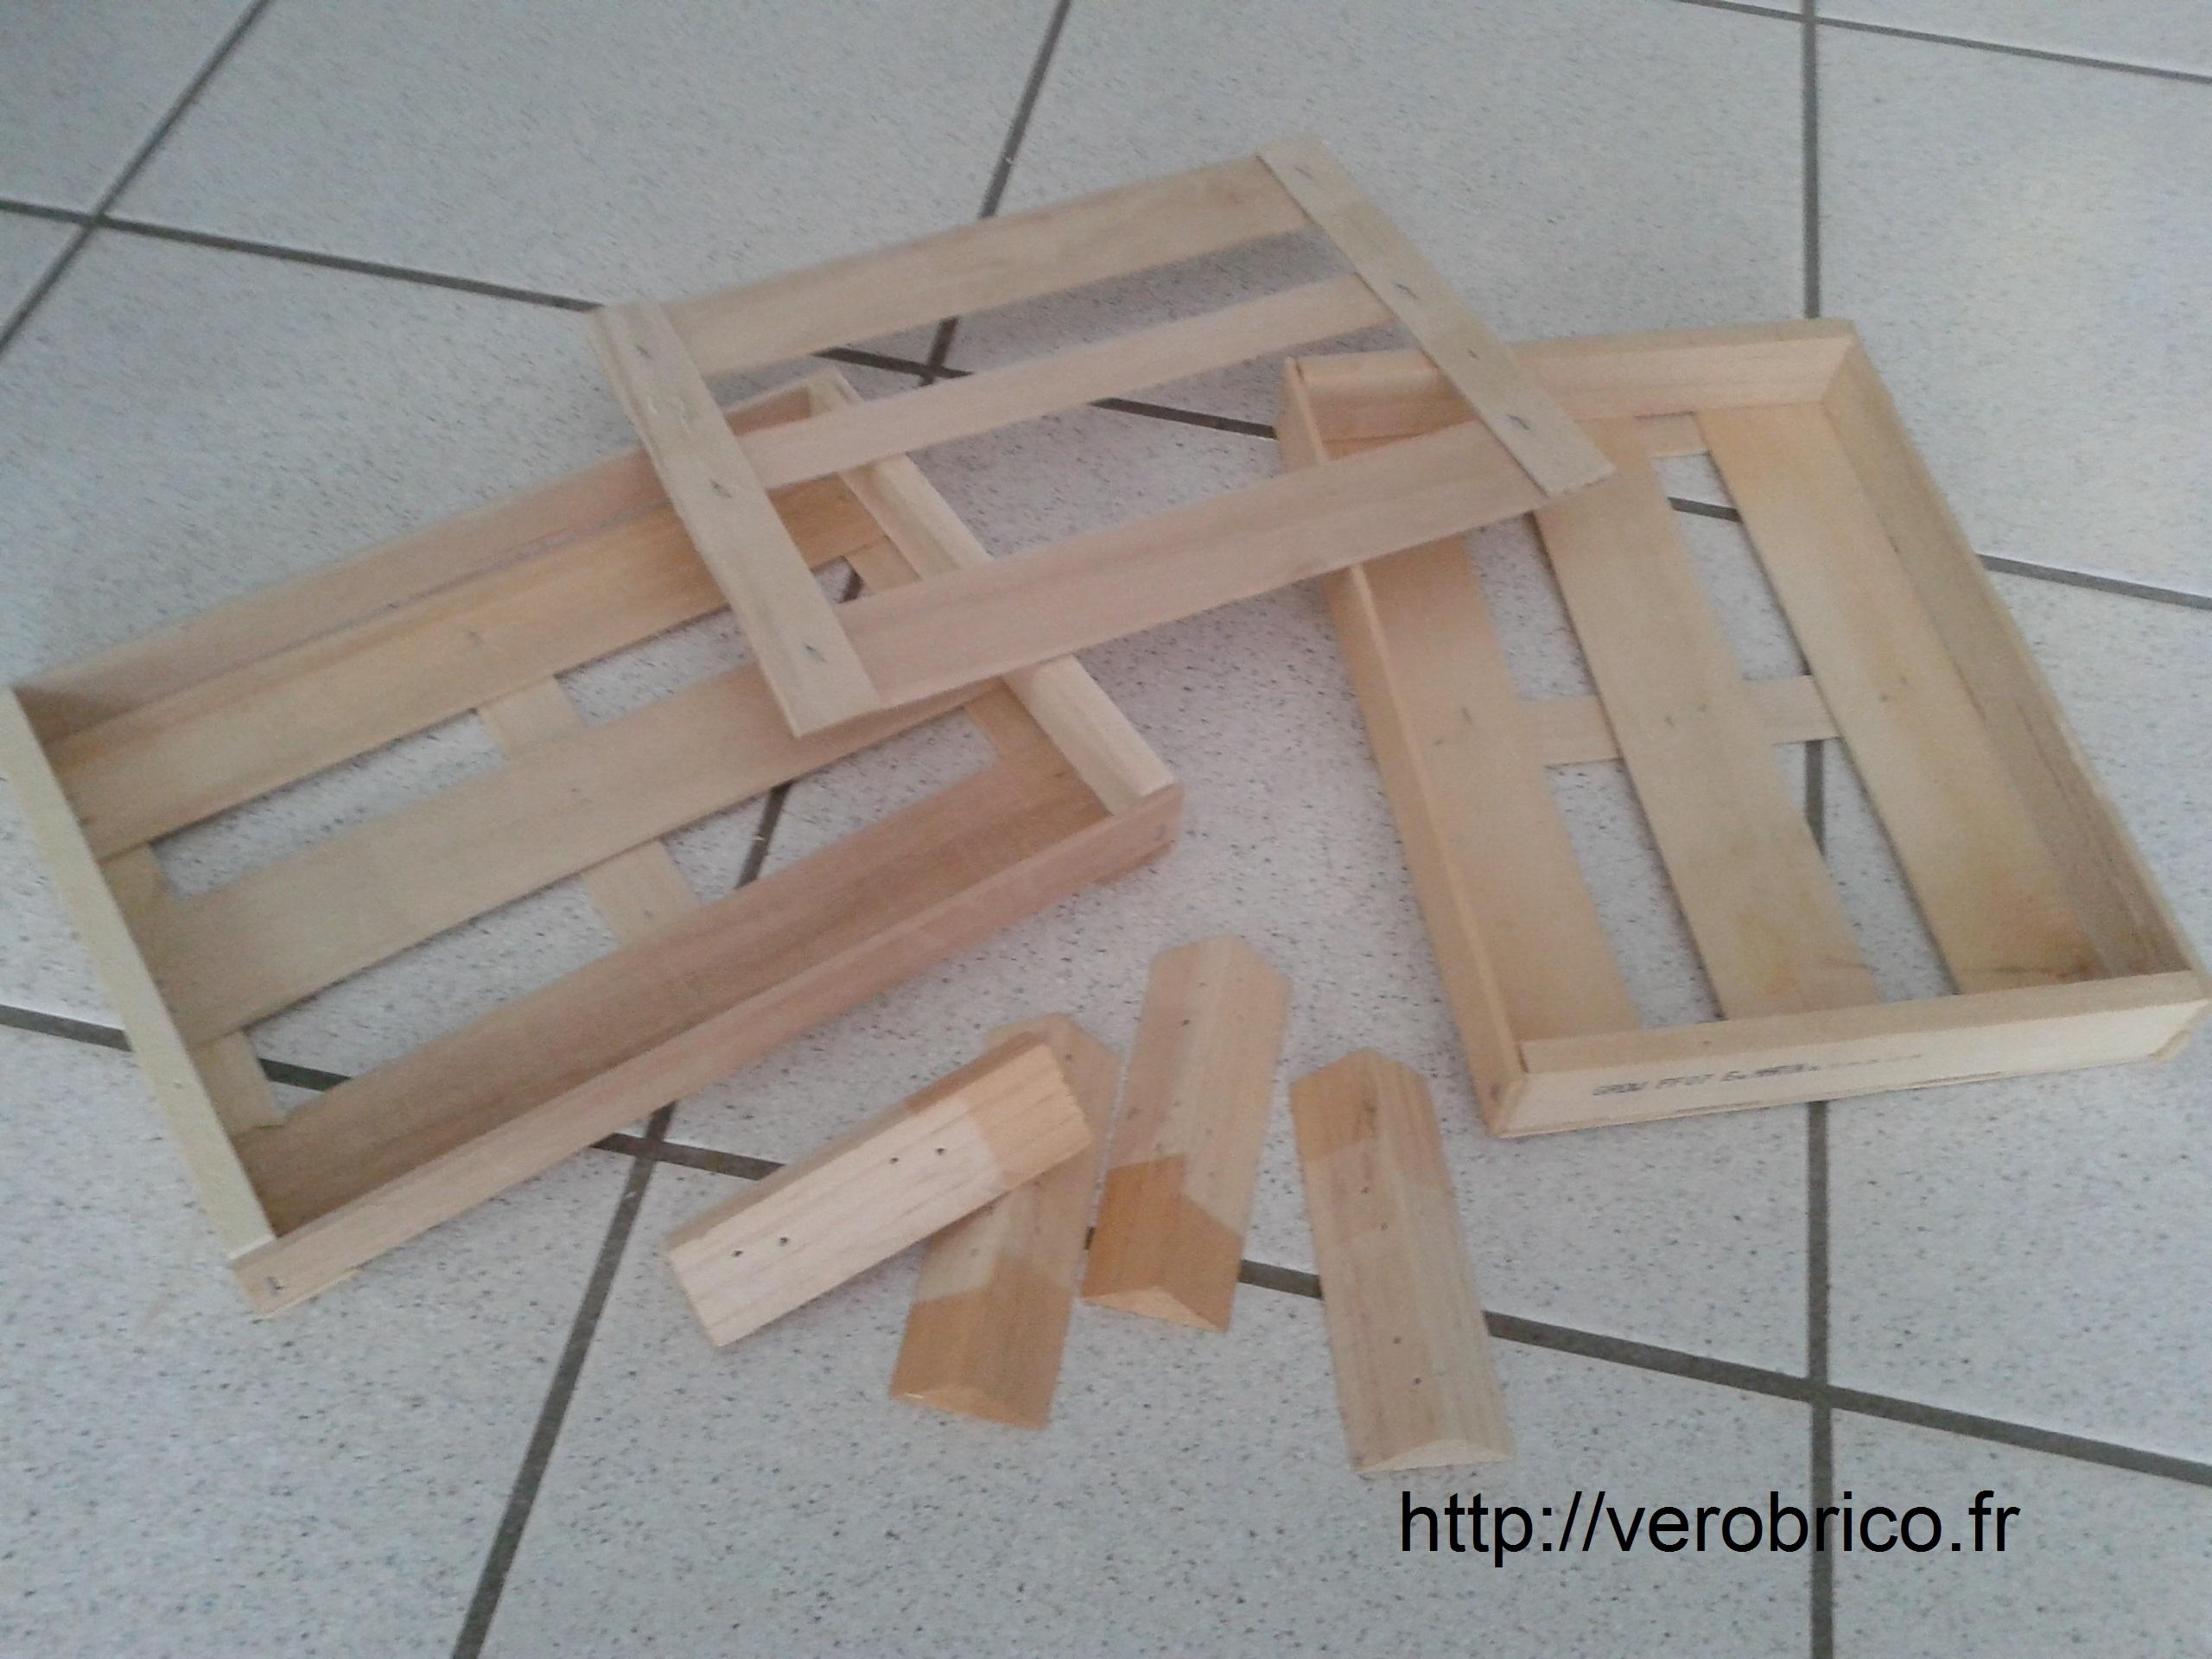 corbeille pain ou bo te pices le coin bricolage de v robrico. Black Bedroom Furniture Sets. Home Design Ideas